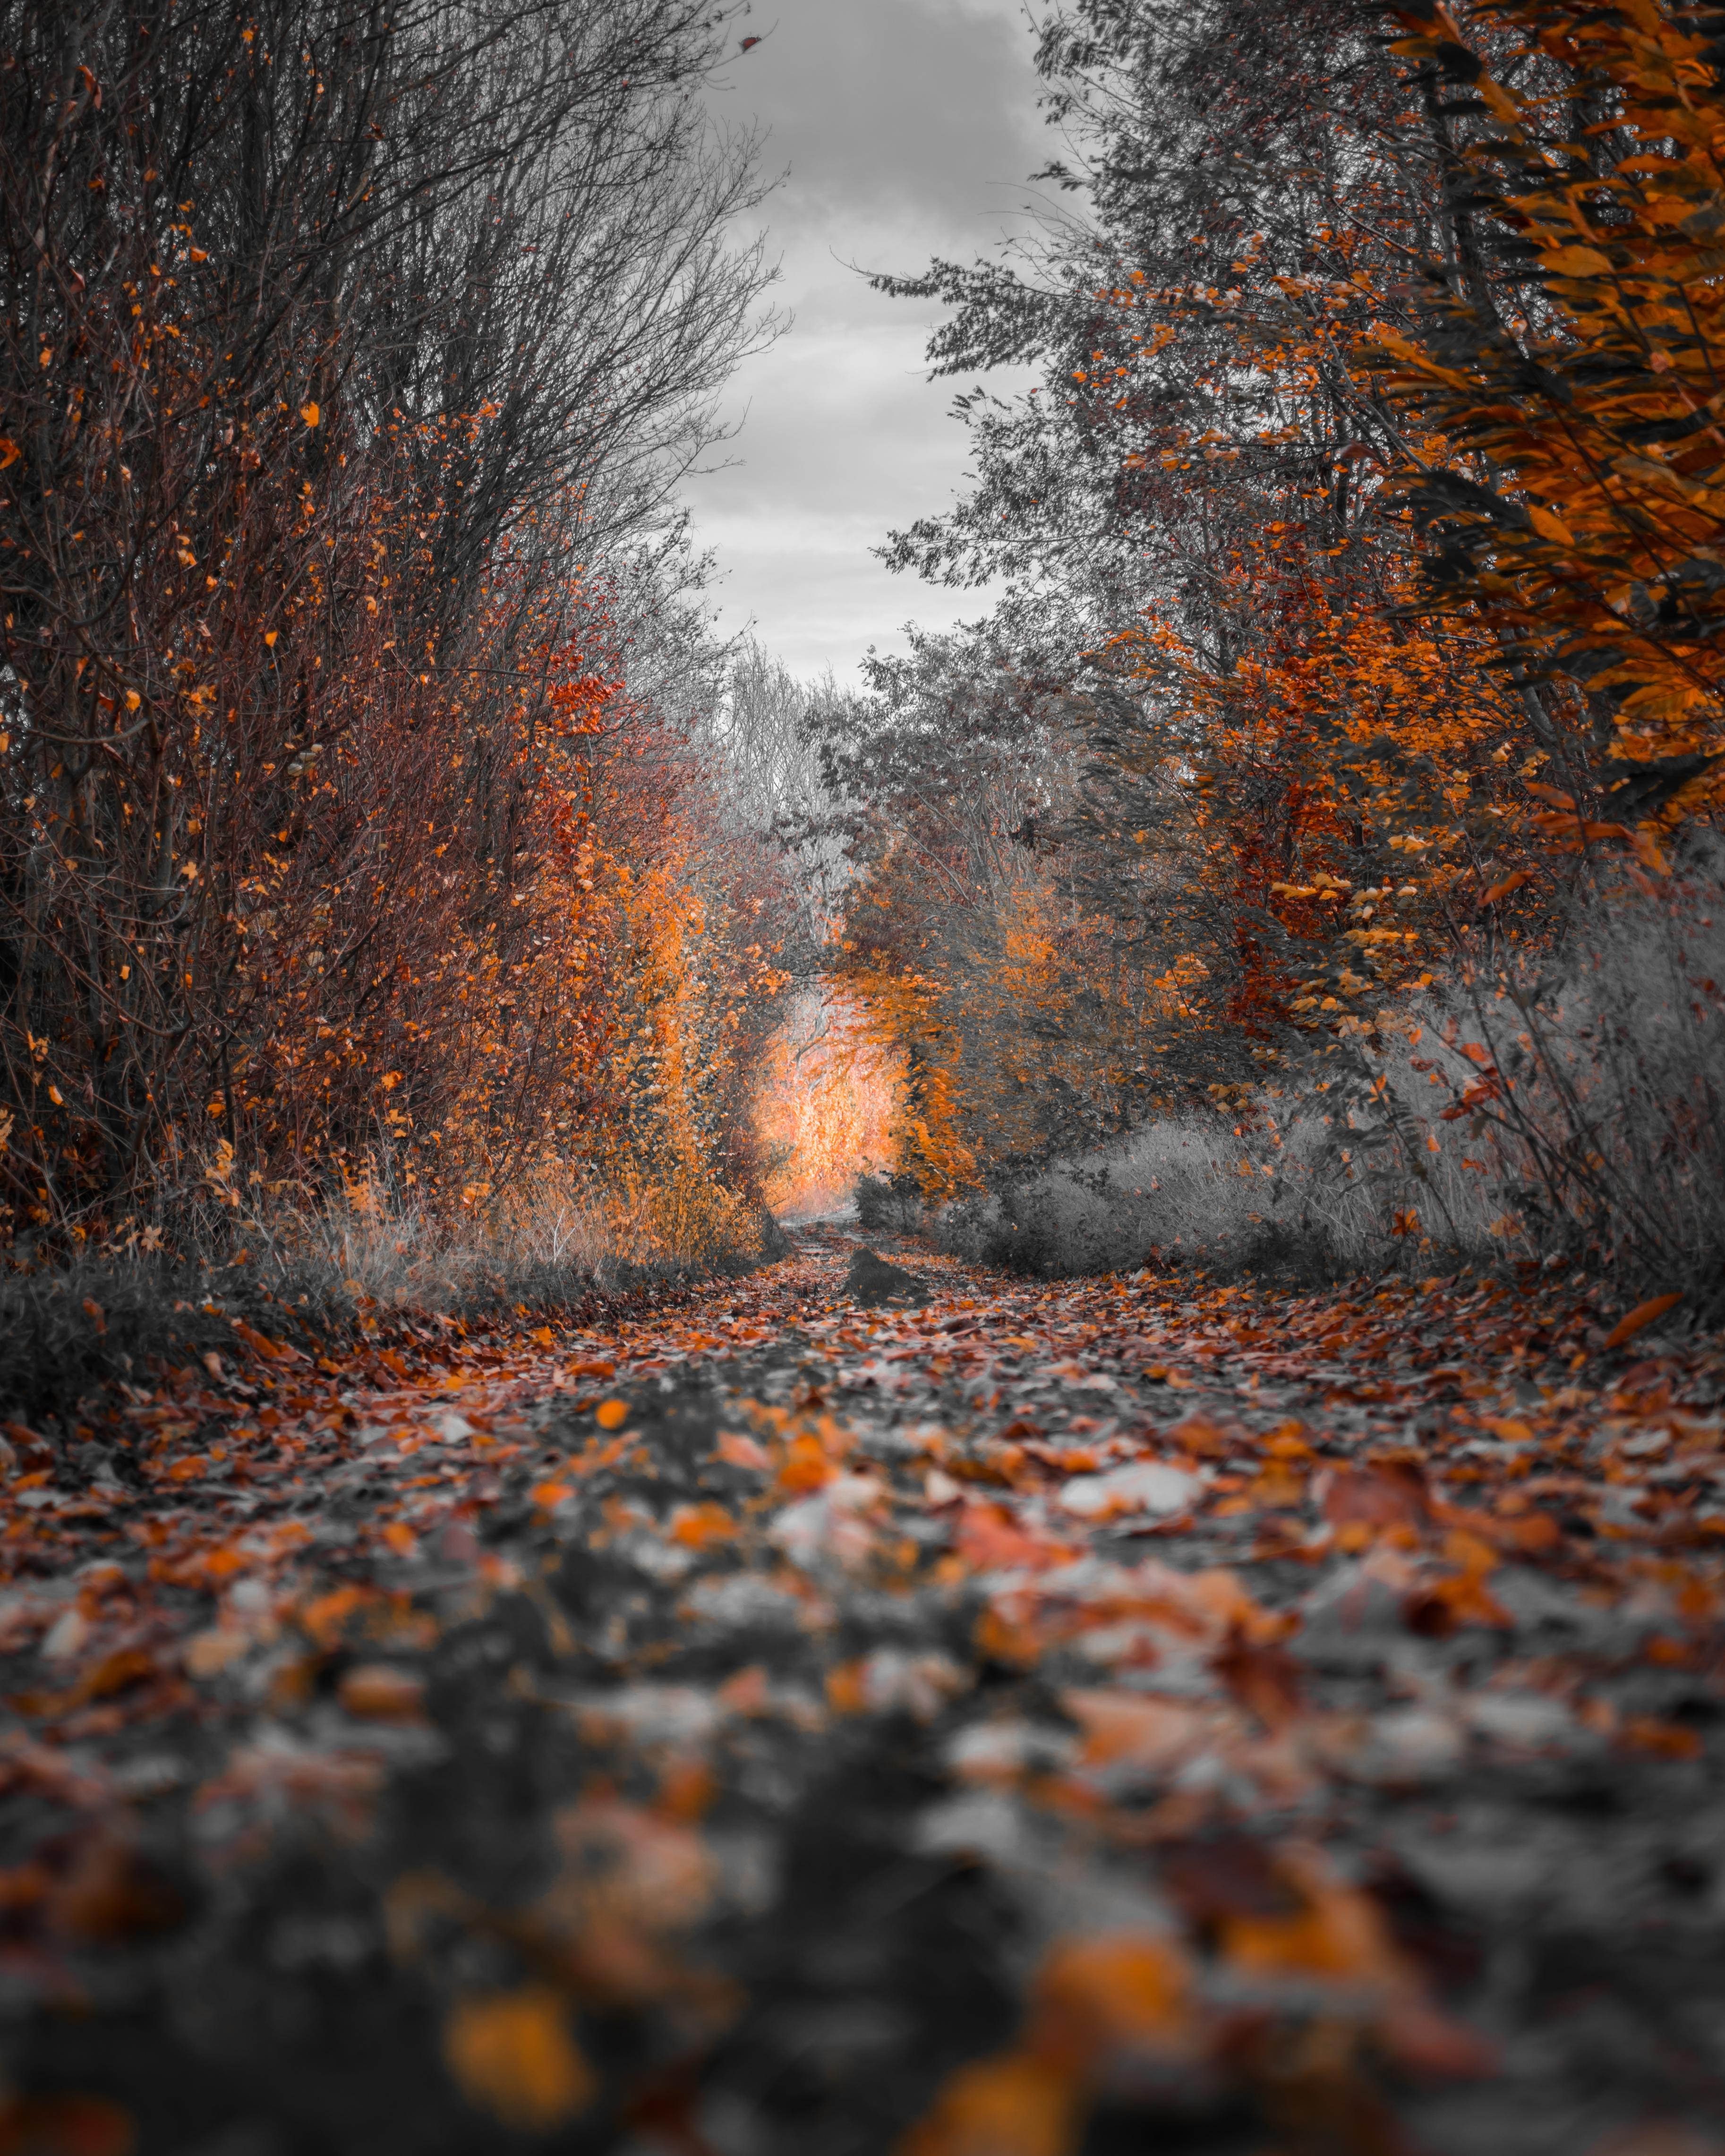 pexels-photo-1591447.jpeg